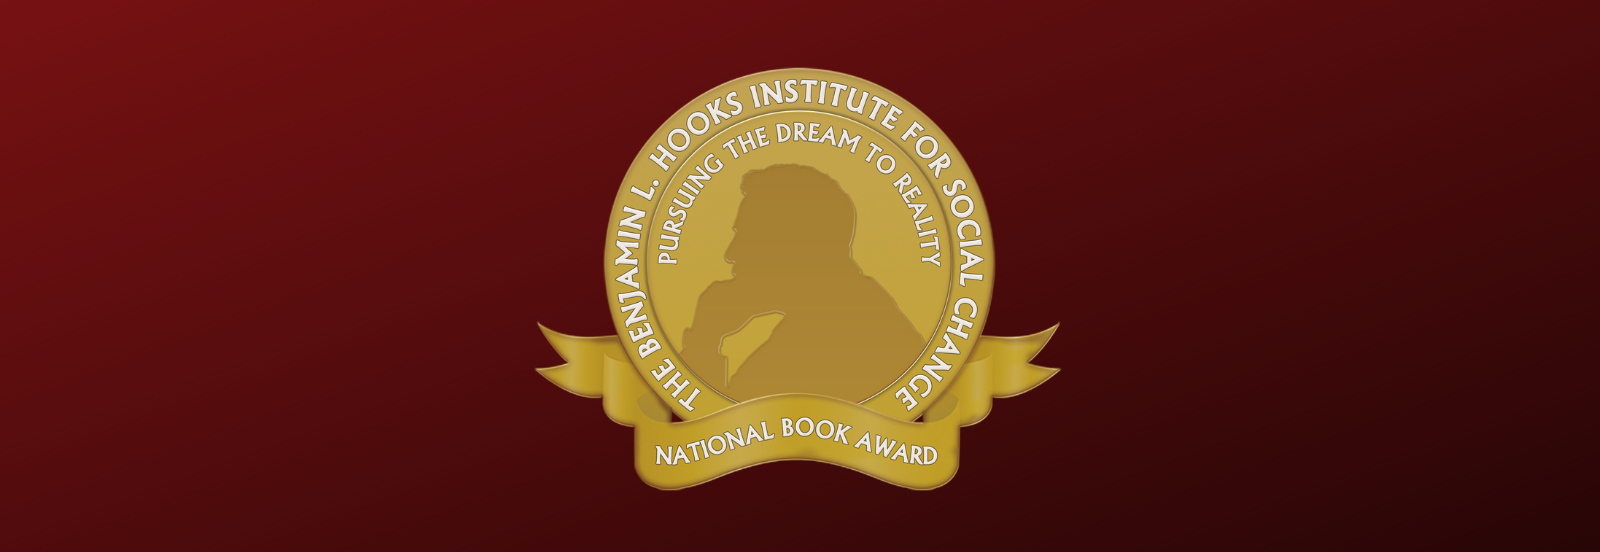 Hooks National Book Award